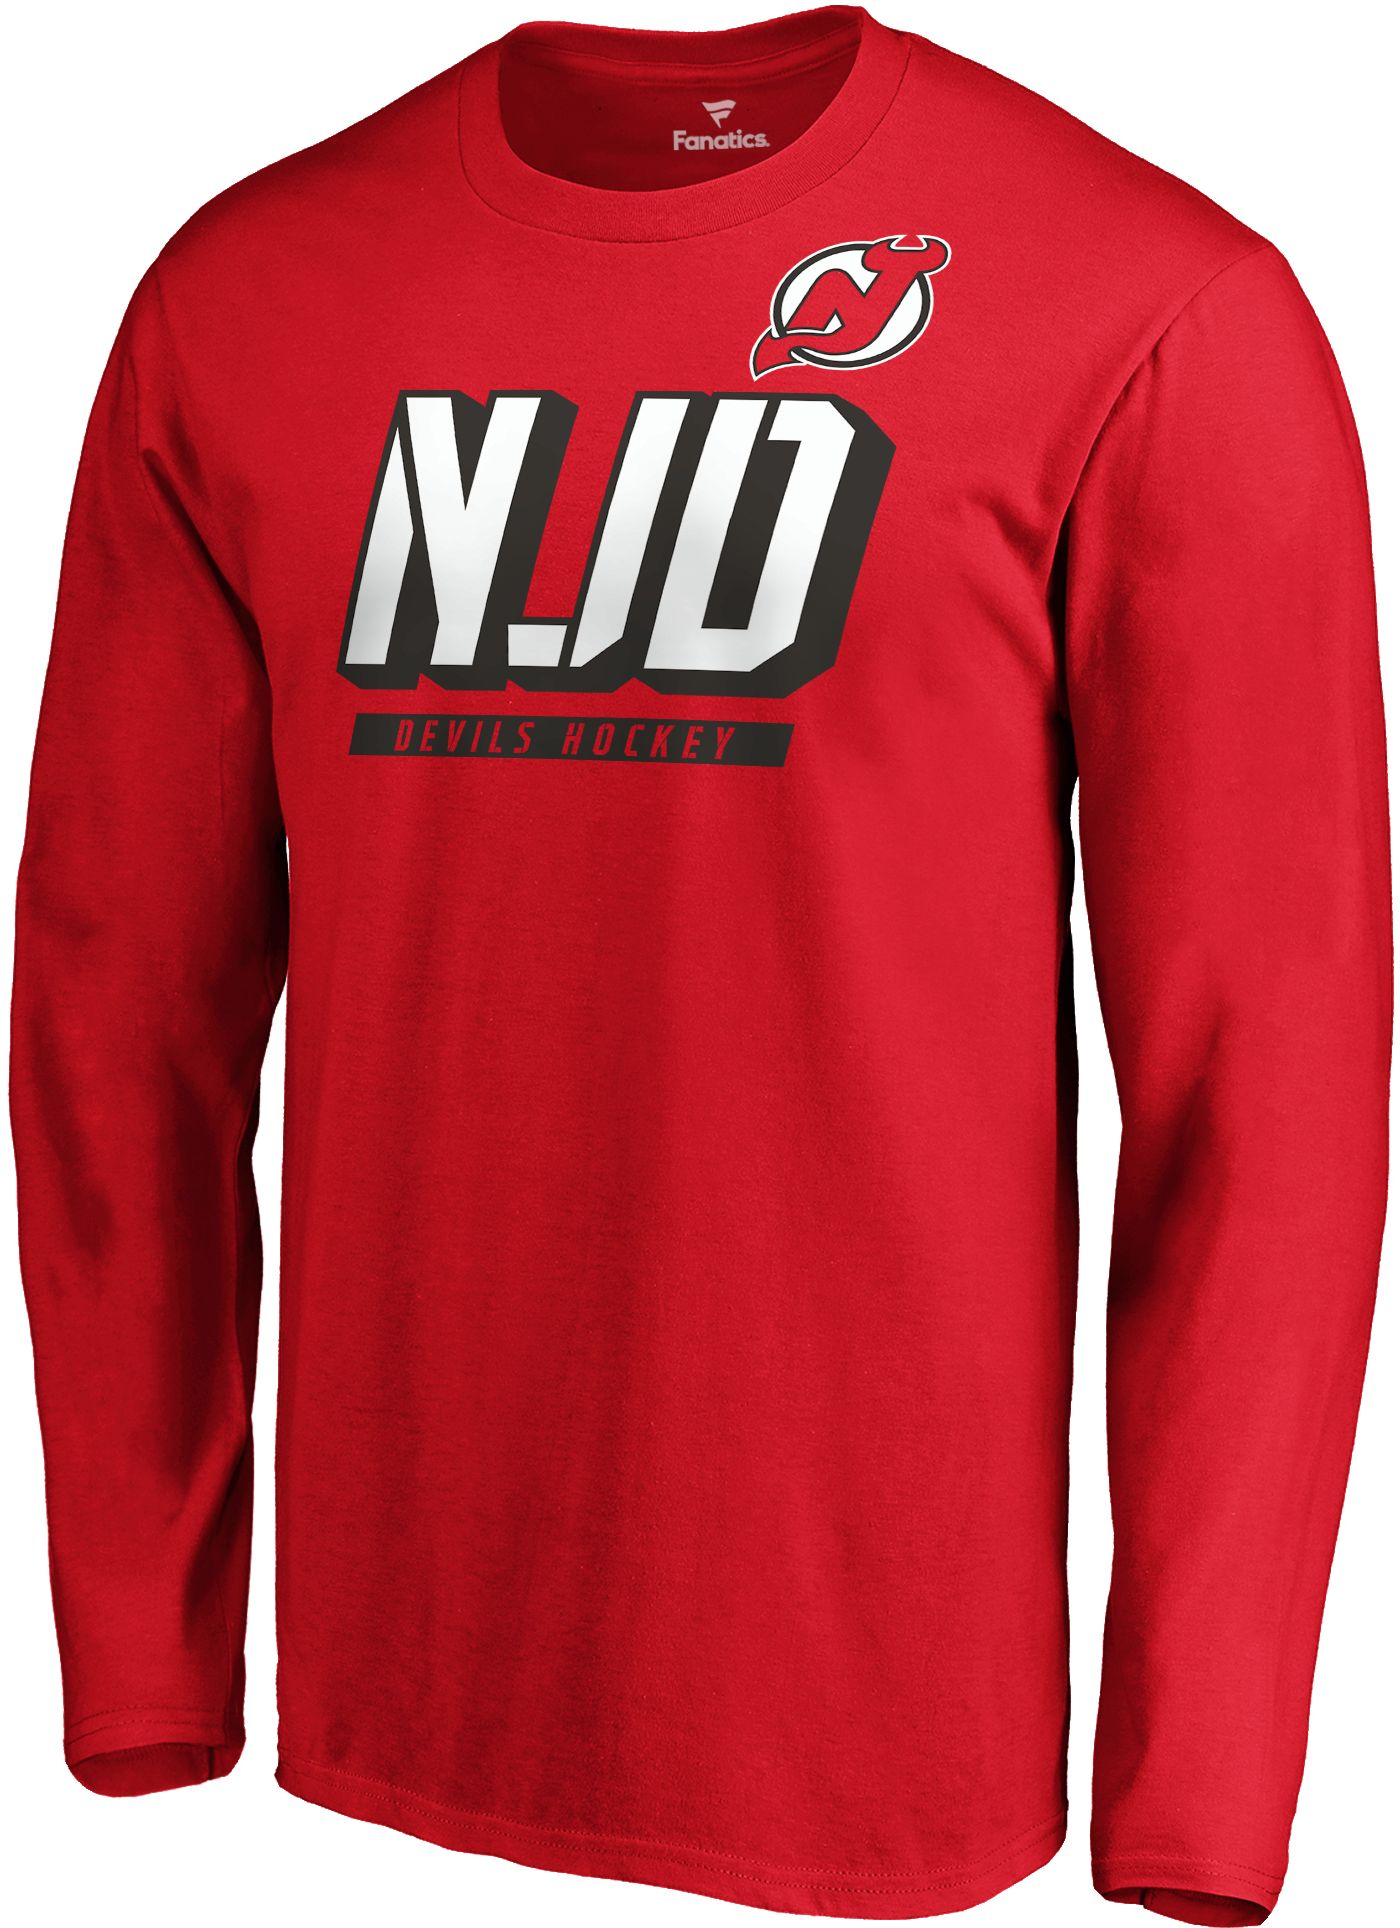 NHL Men's New Jersey Devils Tricode Logo Red Long Sleeve Shirt